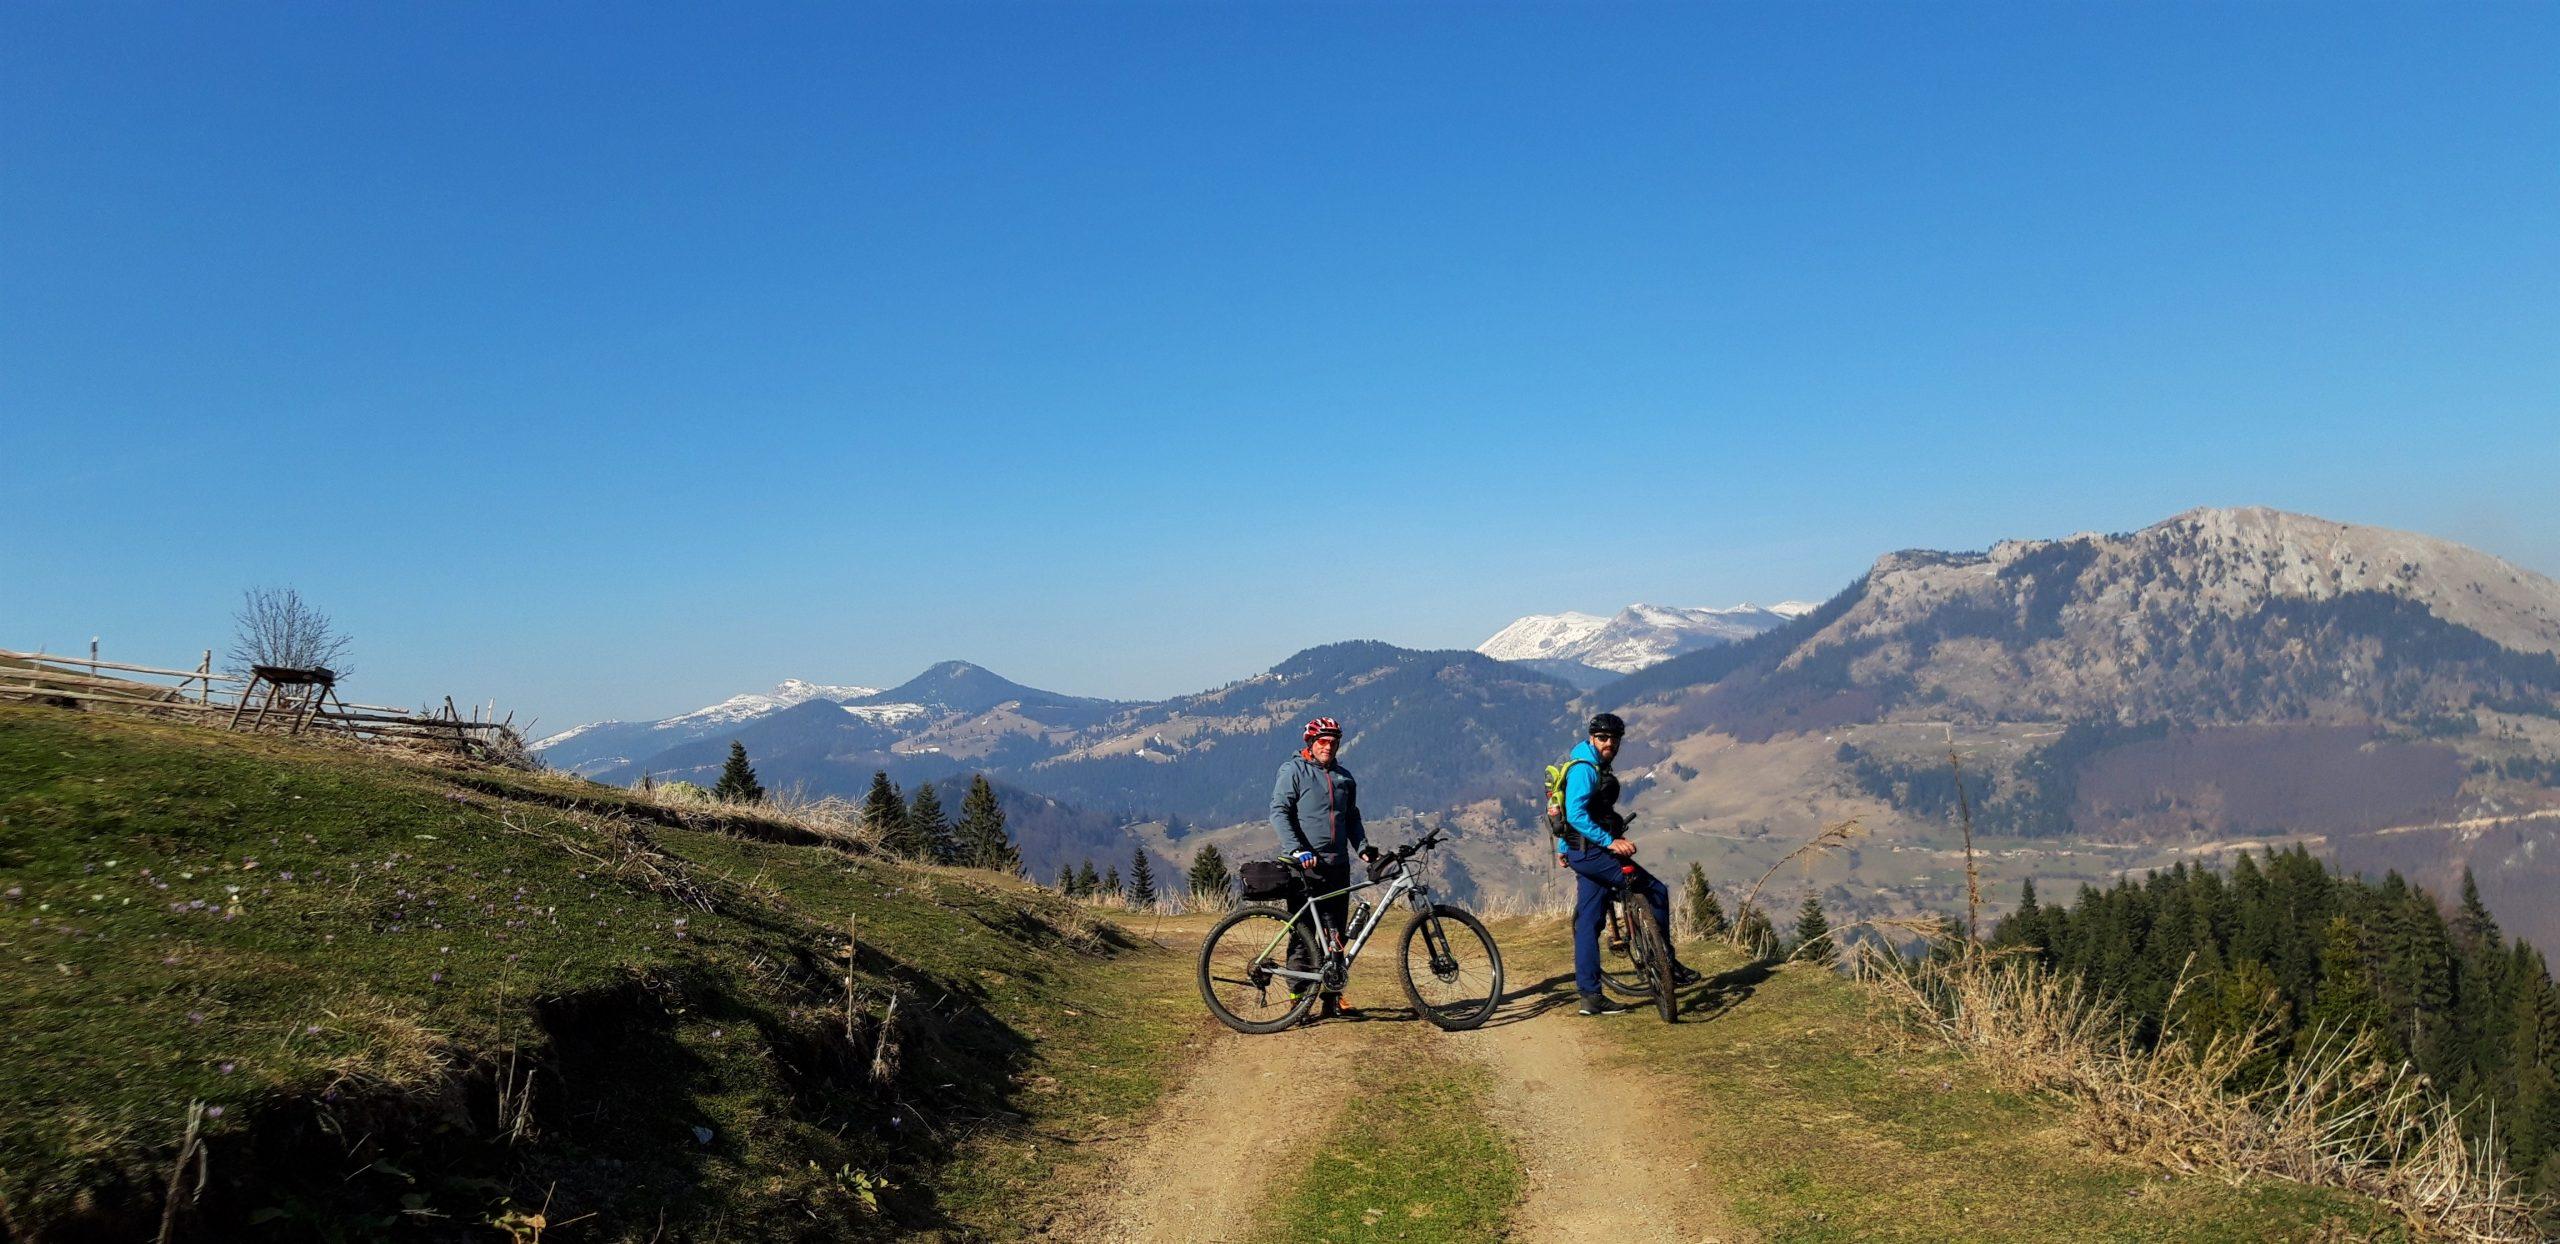 Biking Through Peaks Of The Balkans